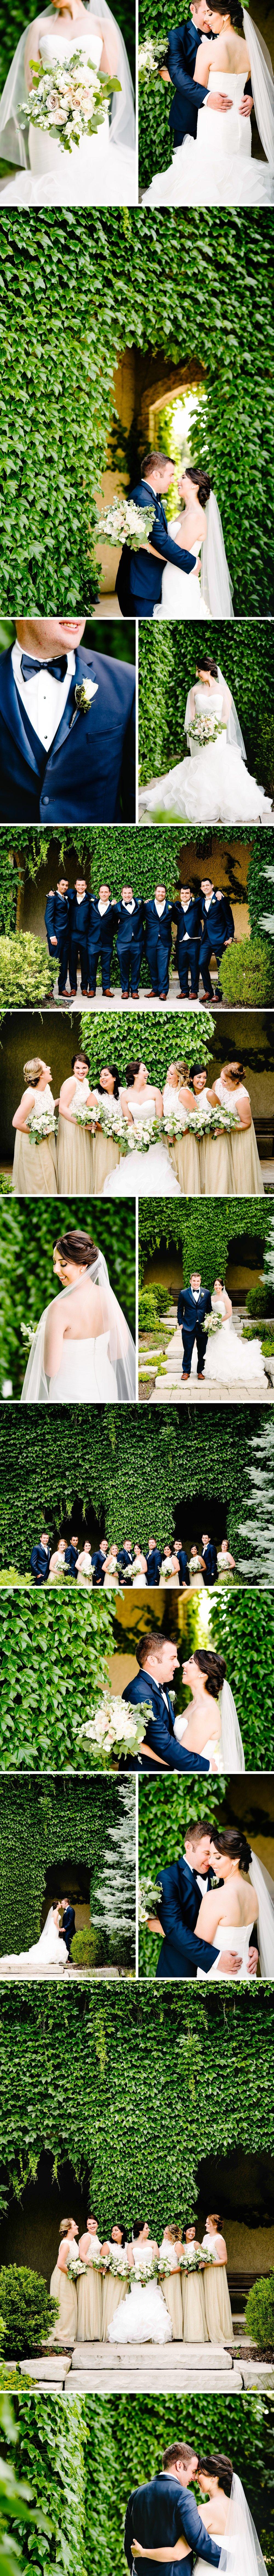 chicago-fine-art-wedding-photography-burdi3